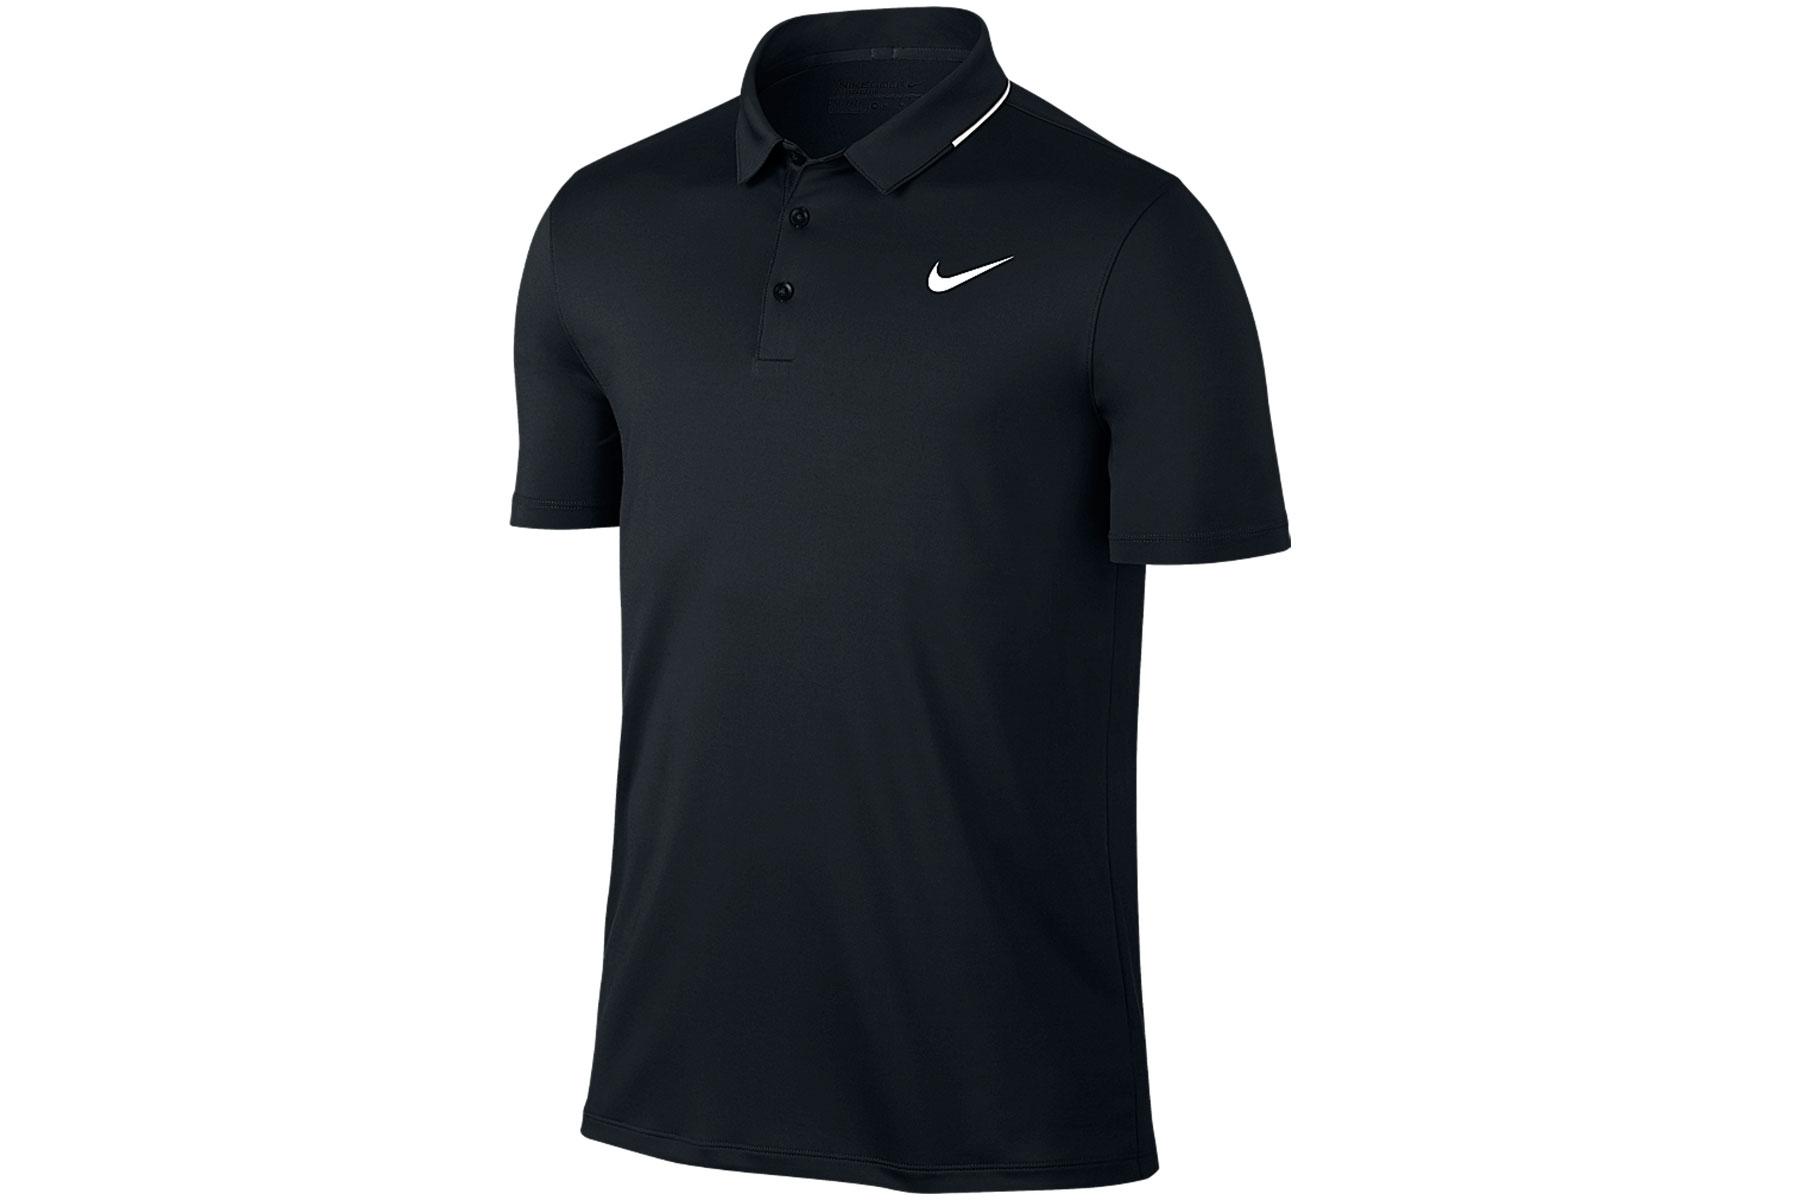 Nike golf icon elite polo shirt online golf for Nike custom polo shirts